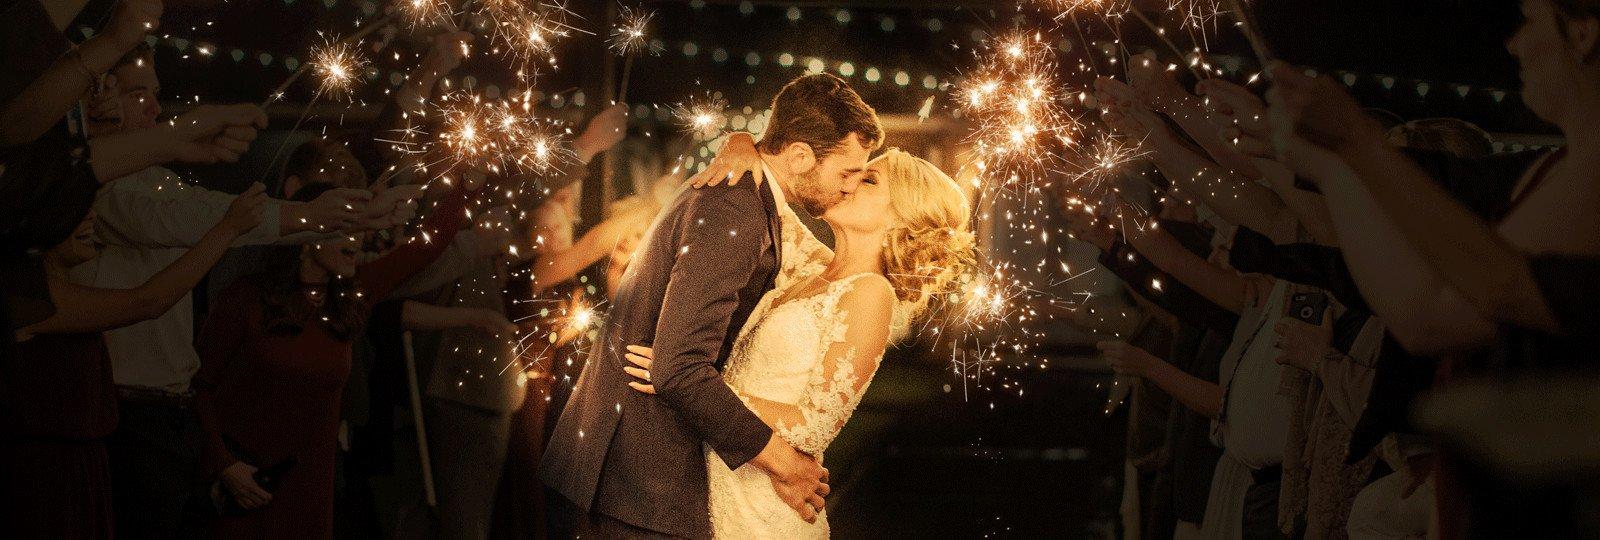 wedding sparklers slider